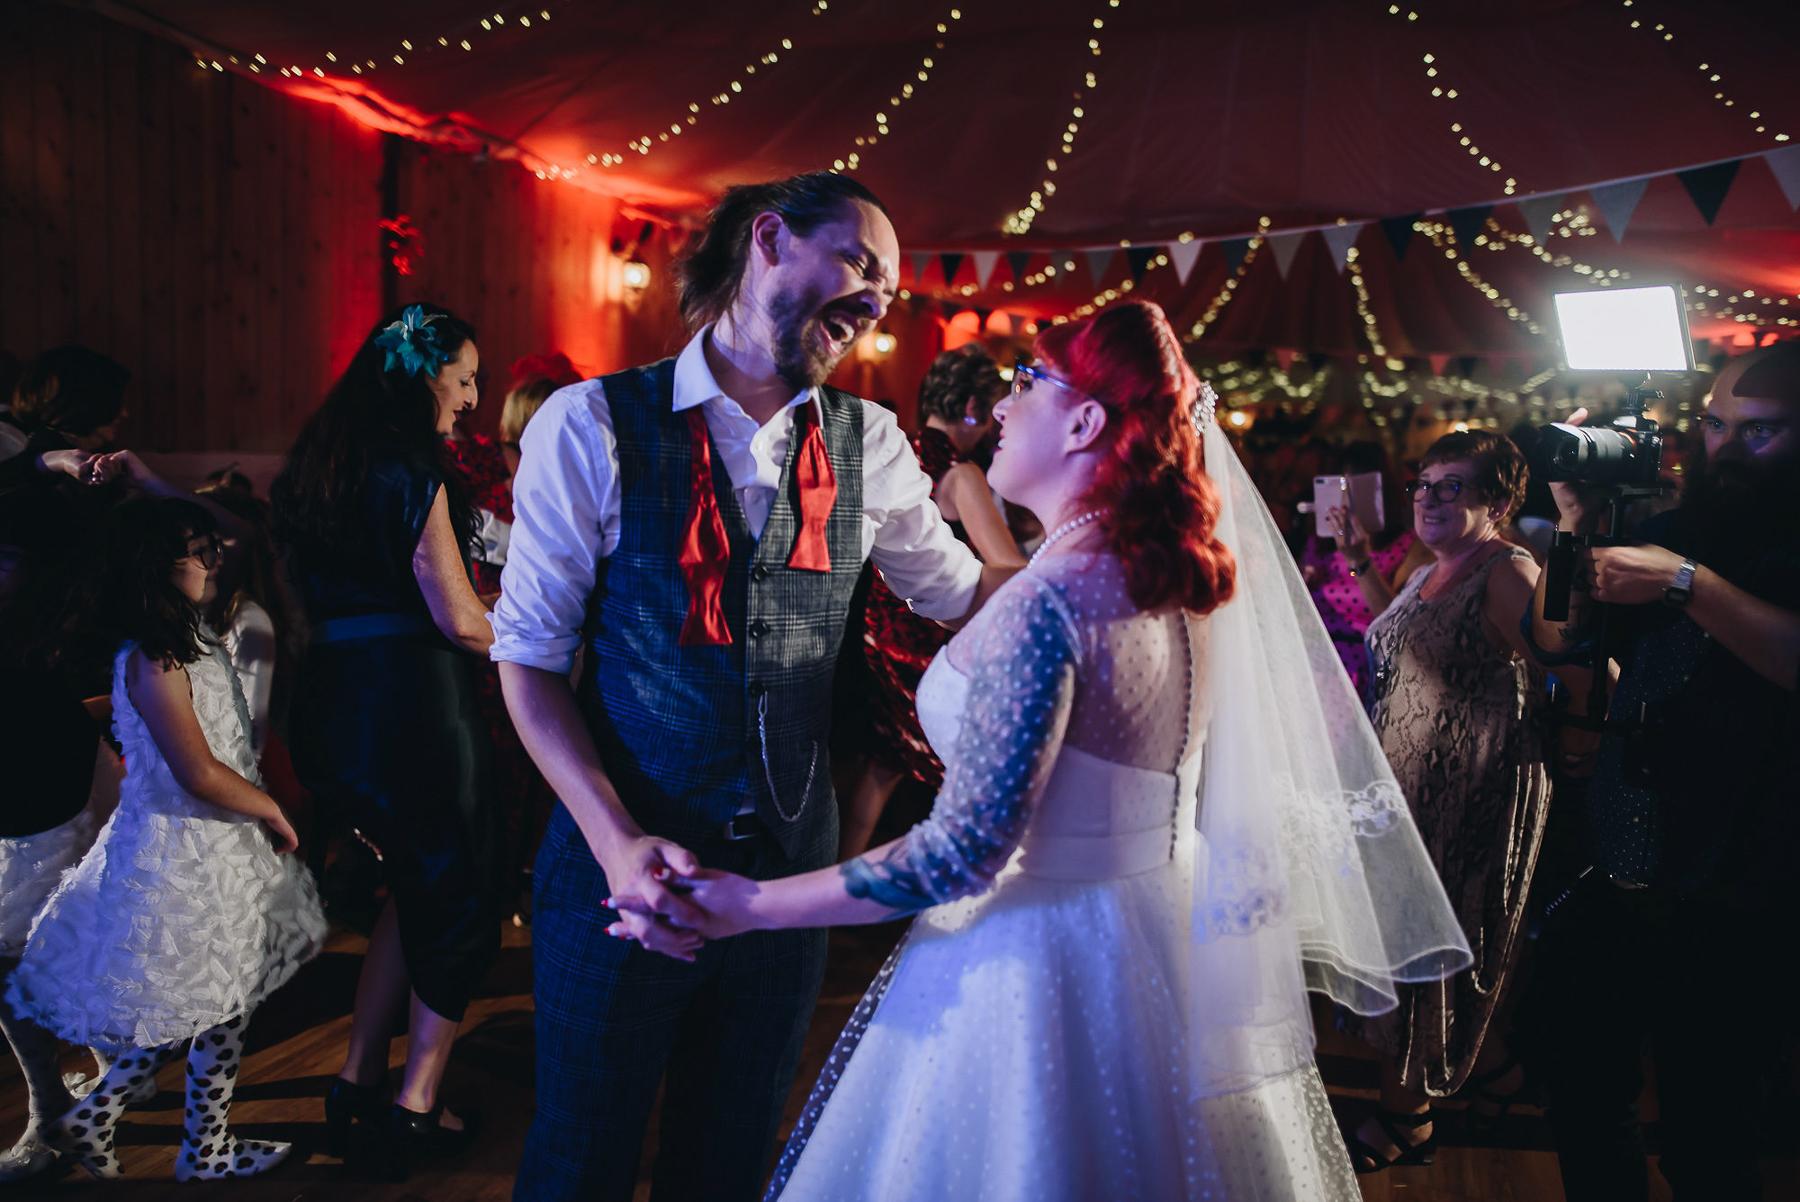 Wellbeing_Farm_Wedding_Photography_The_Pin-Up_Bride_Lara_Shaun-143.jpg